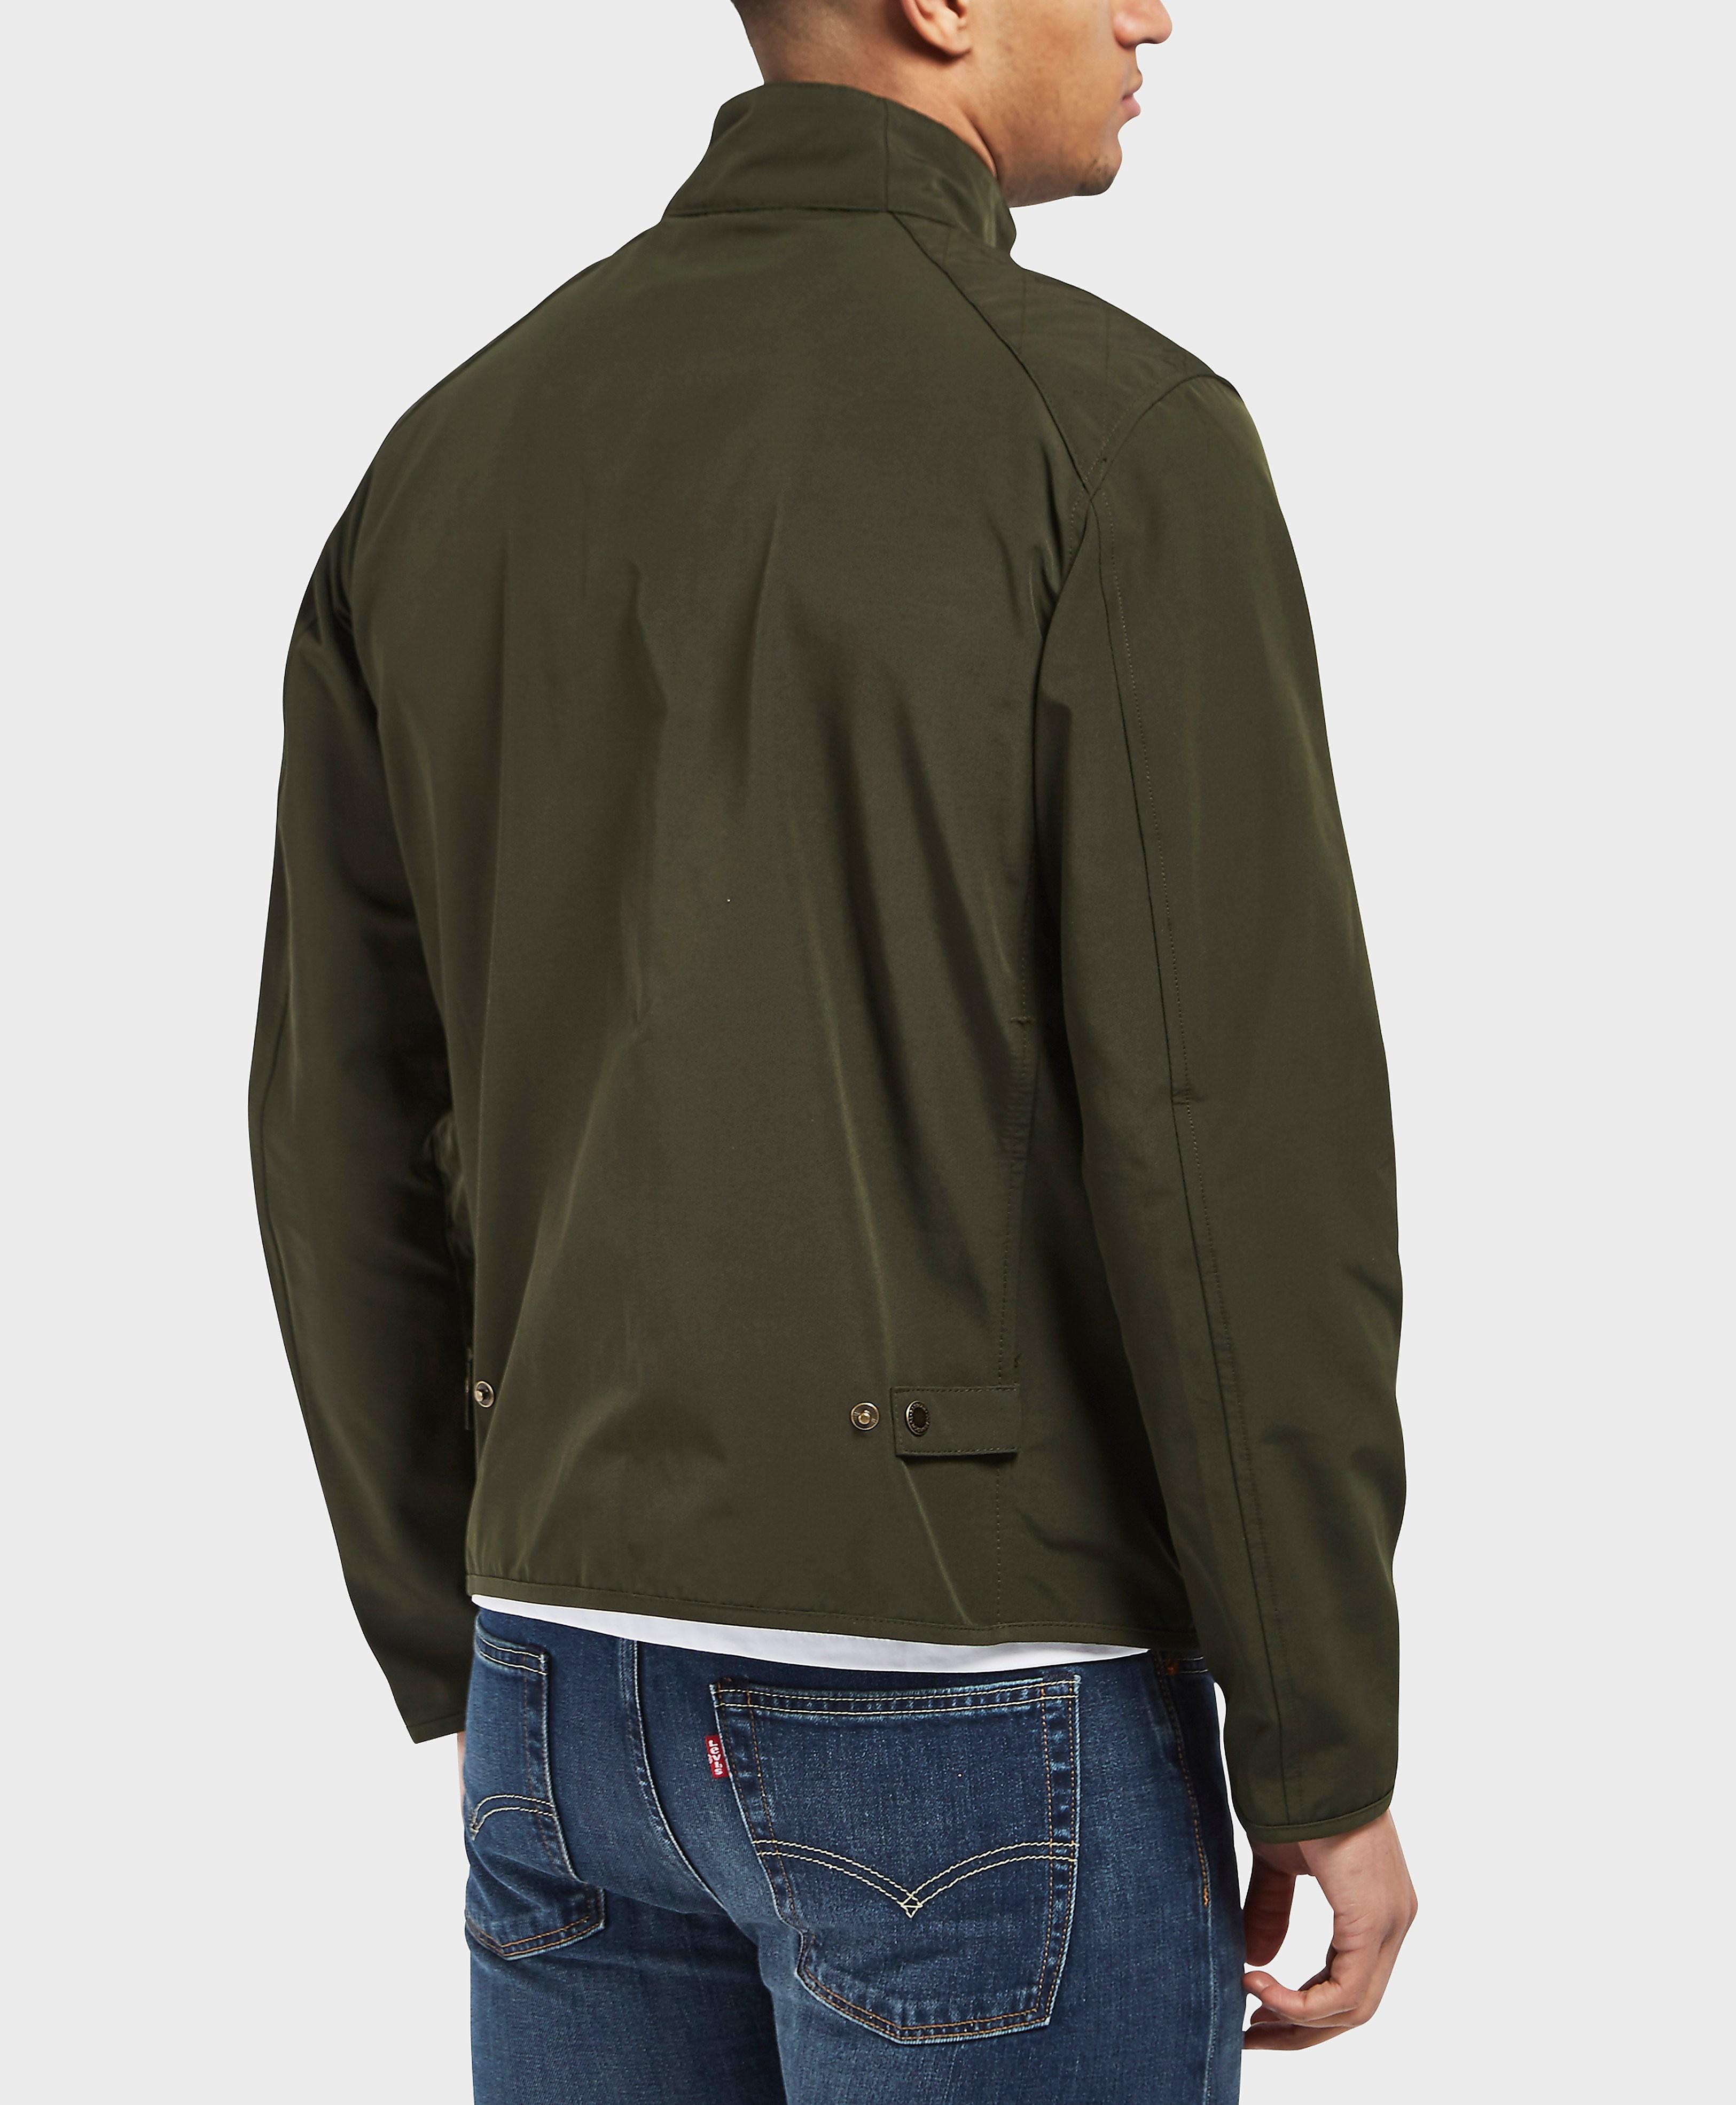 Barbour International Persuit Lightweight Jacket